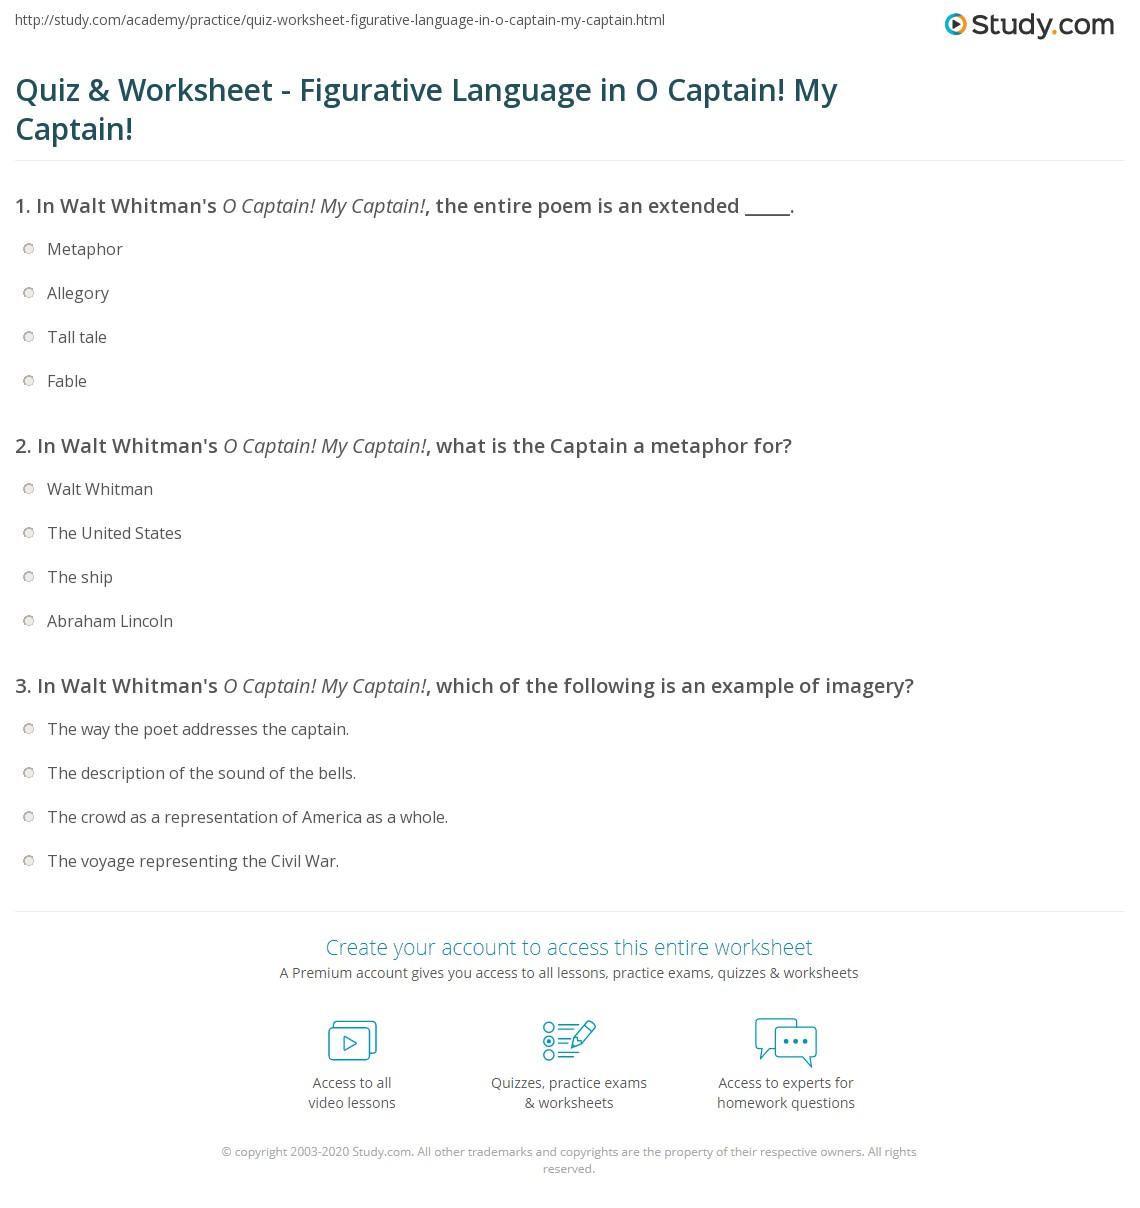 quiz worksheet figurative language in o captain my captain print figurative language in o captain my captain worksheet